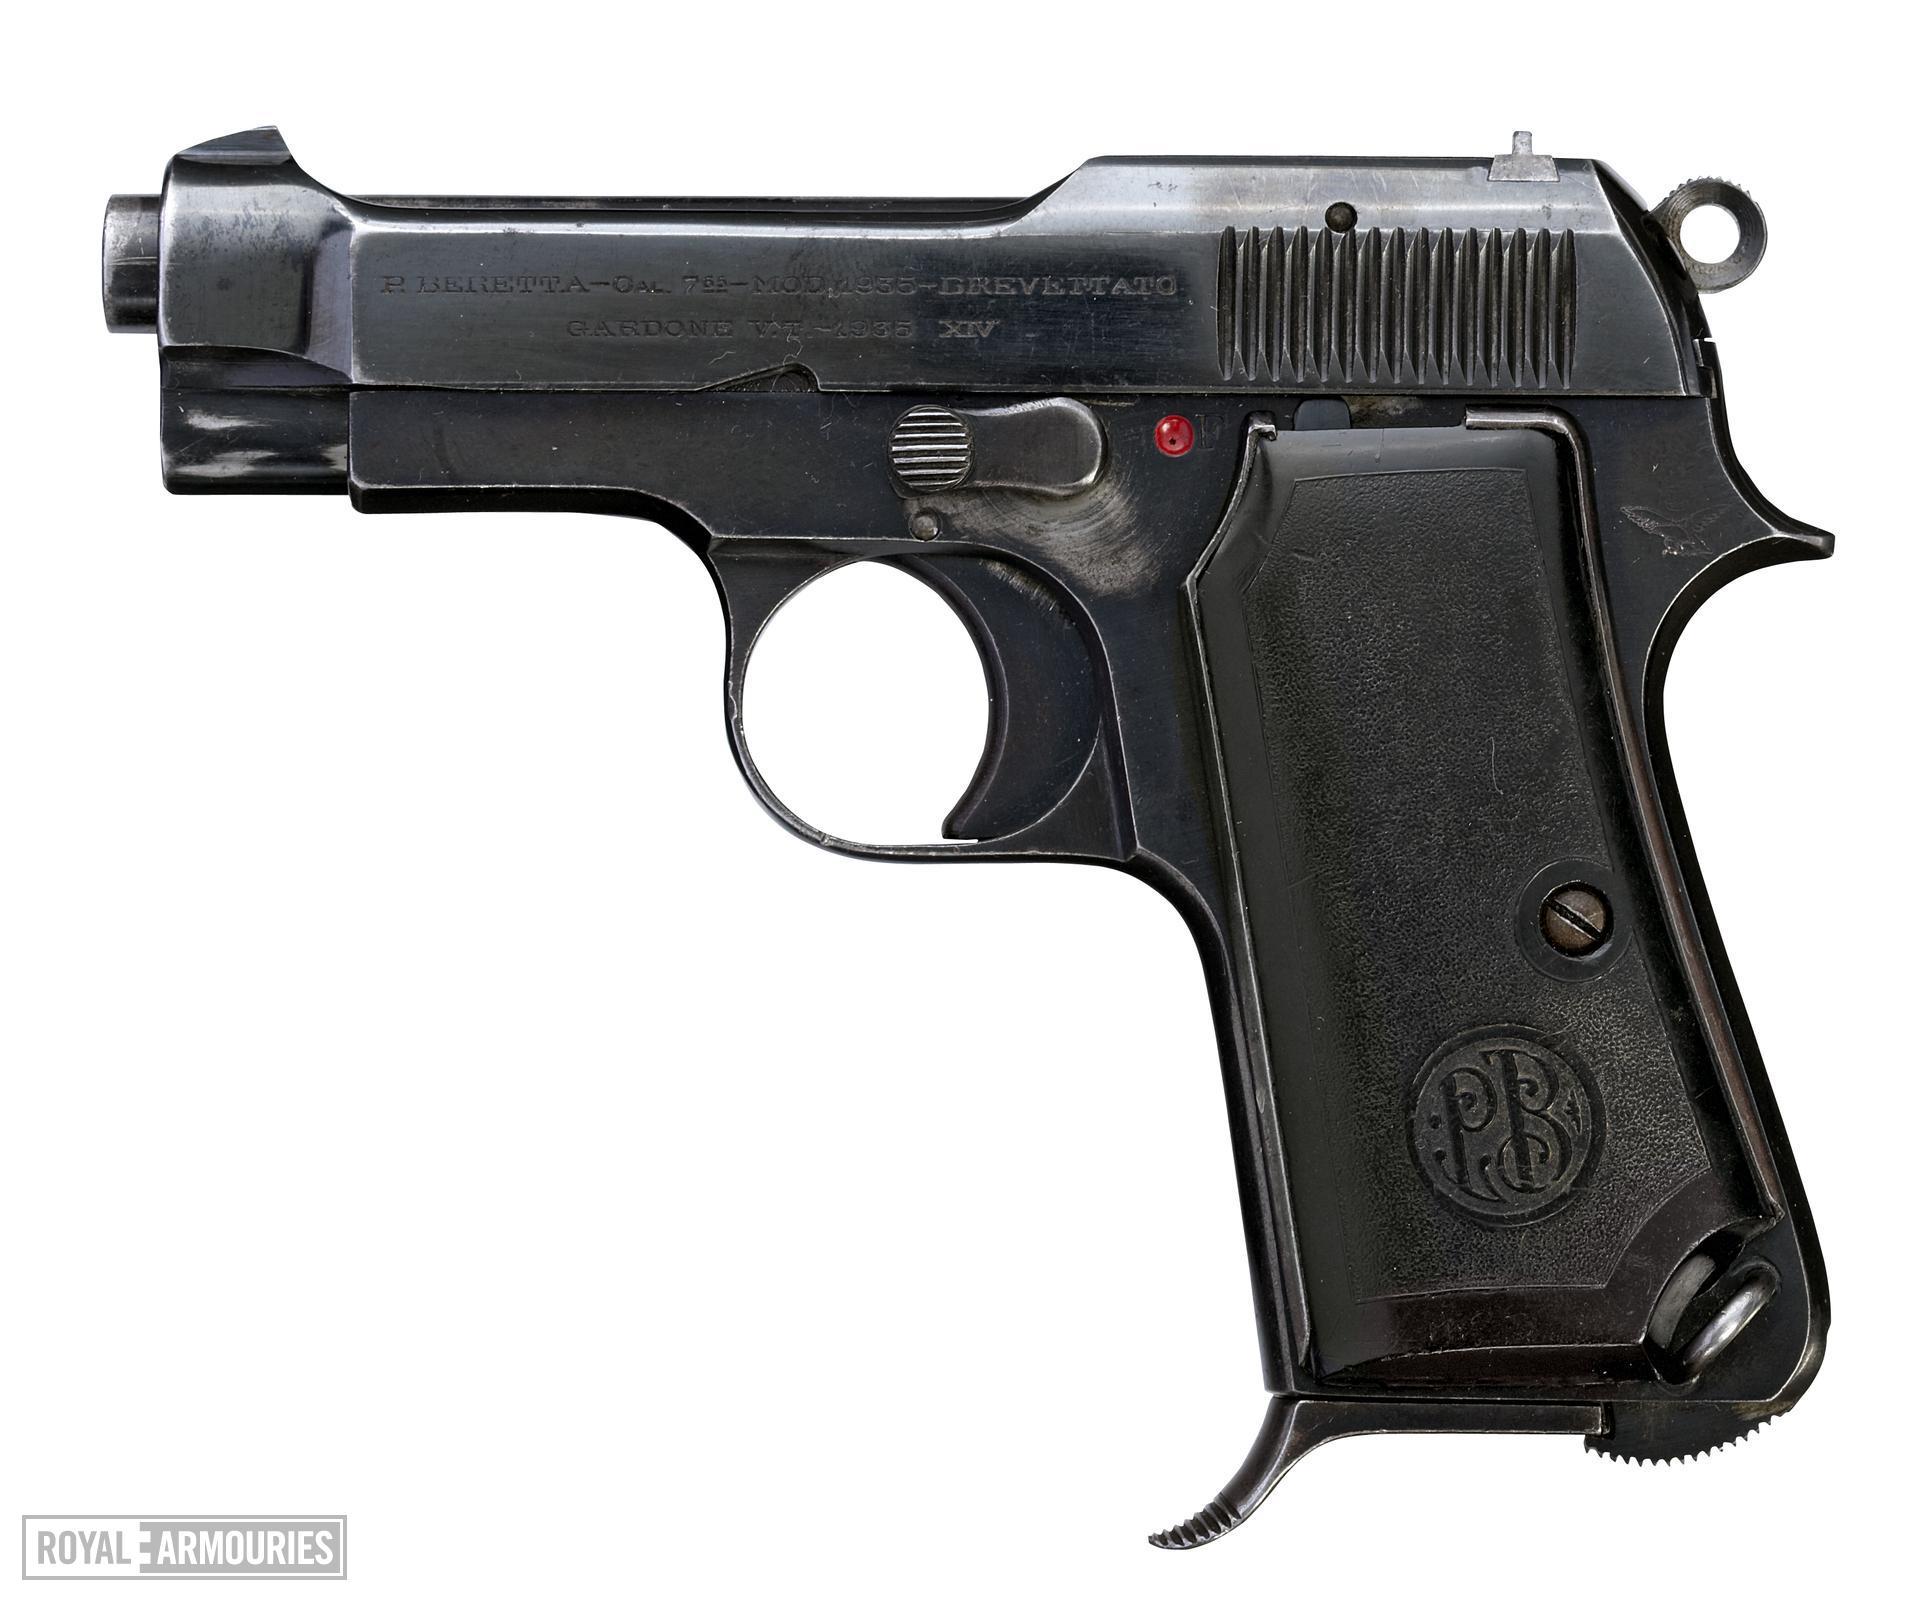 Centrefire self-loading pistol - Beretta Model 1935